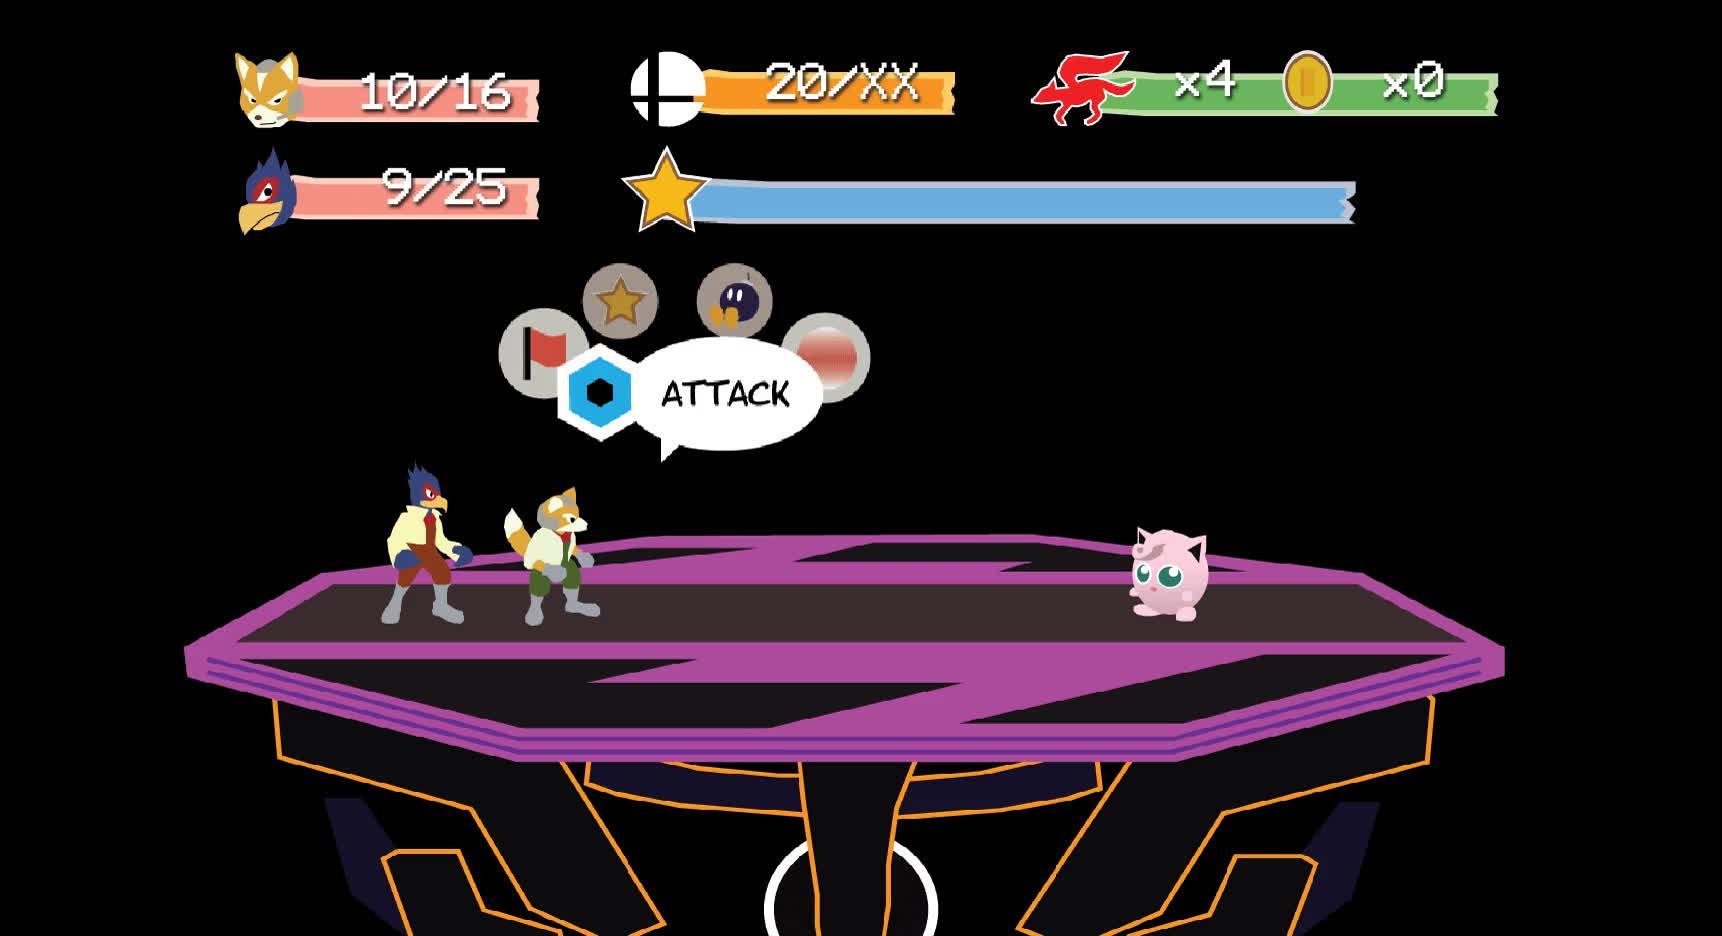 [ART] Super Smash Bros. Melee RPG (